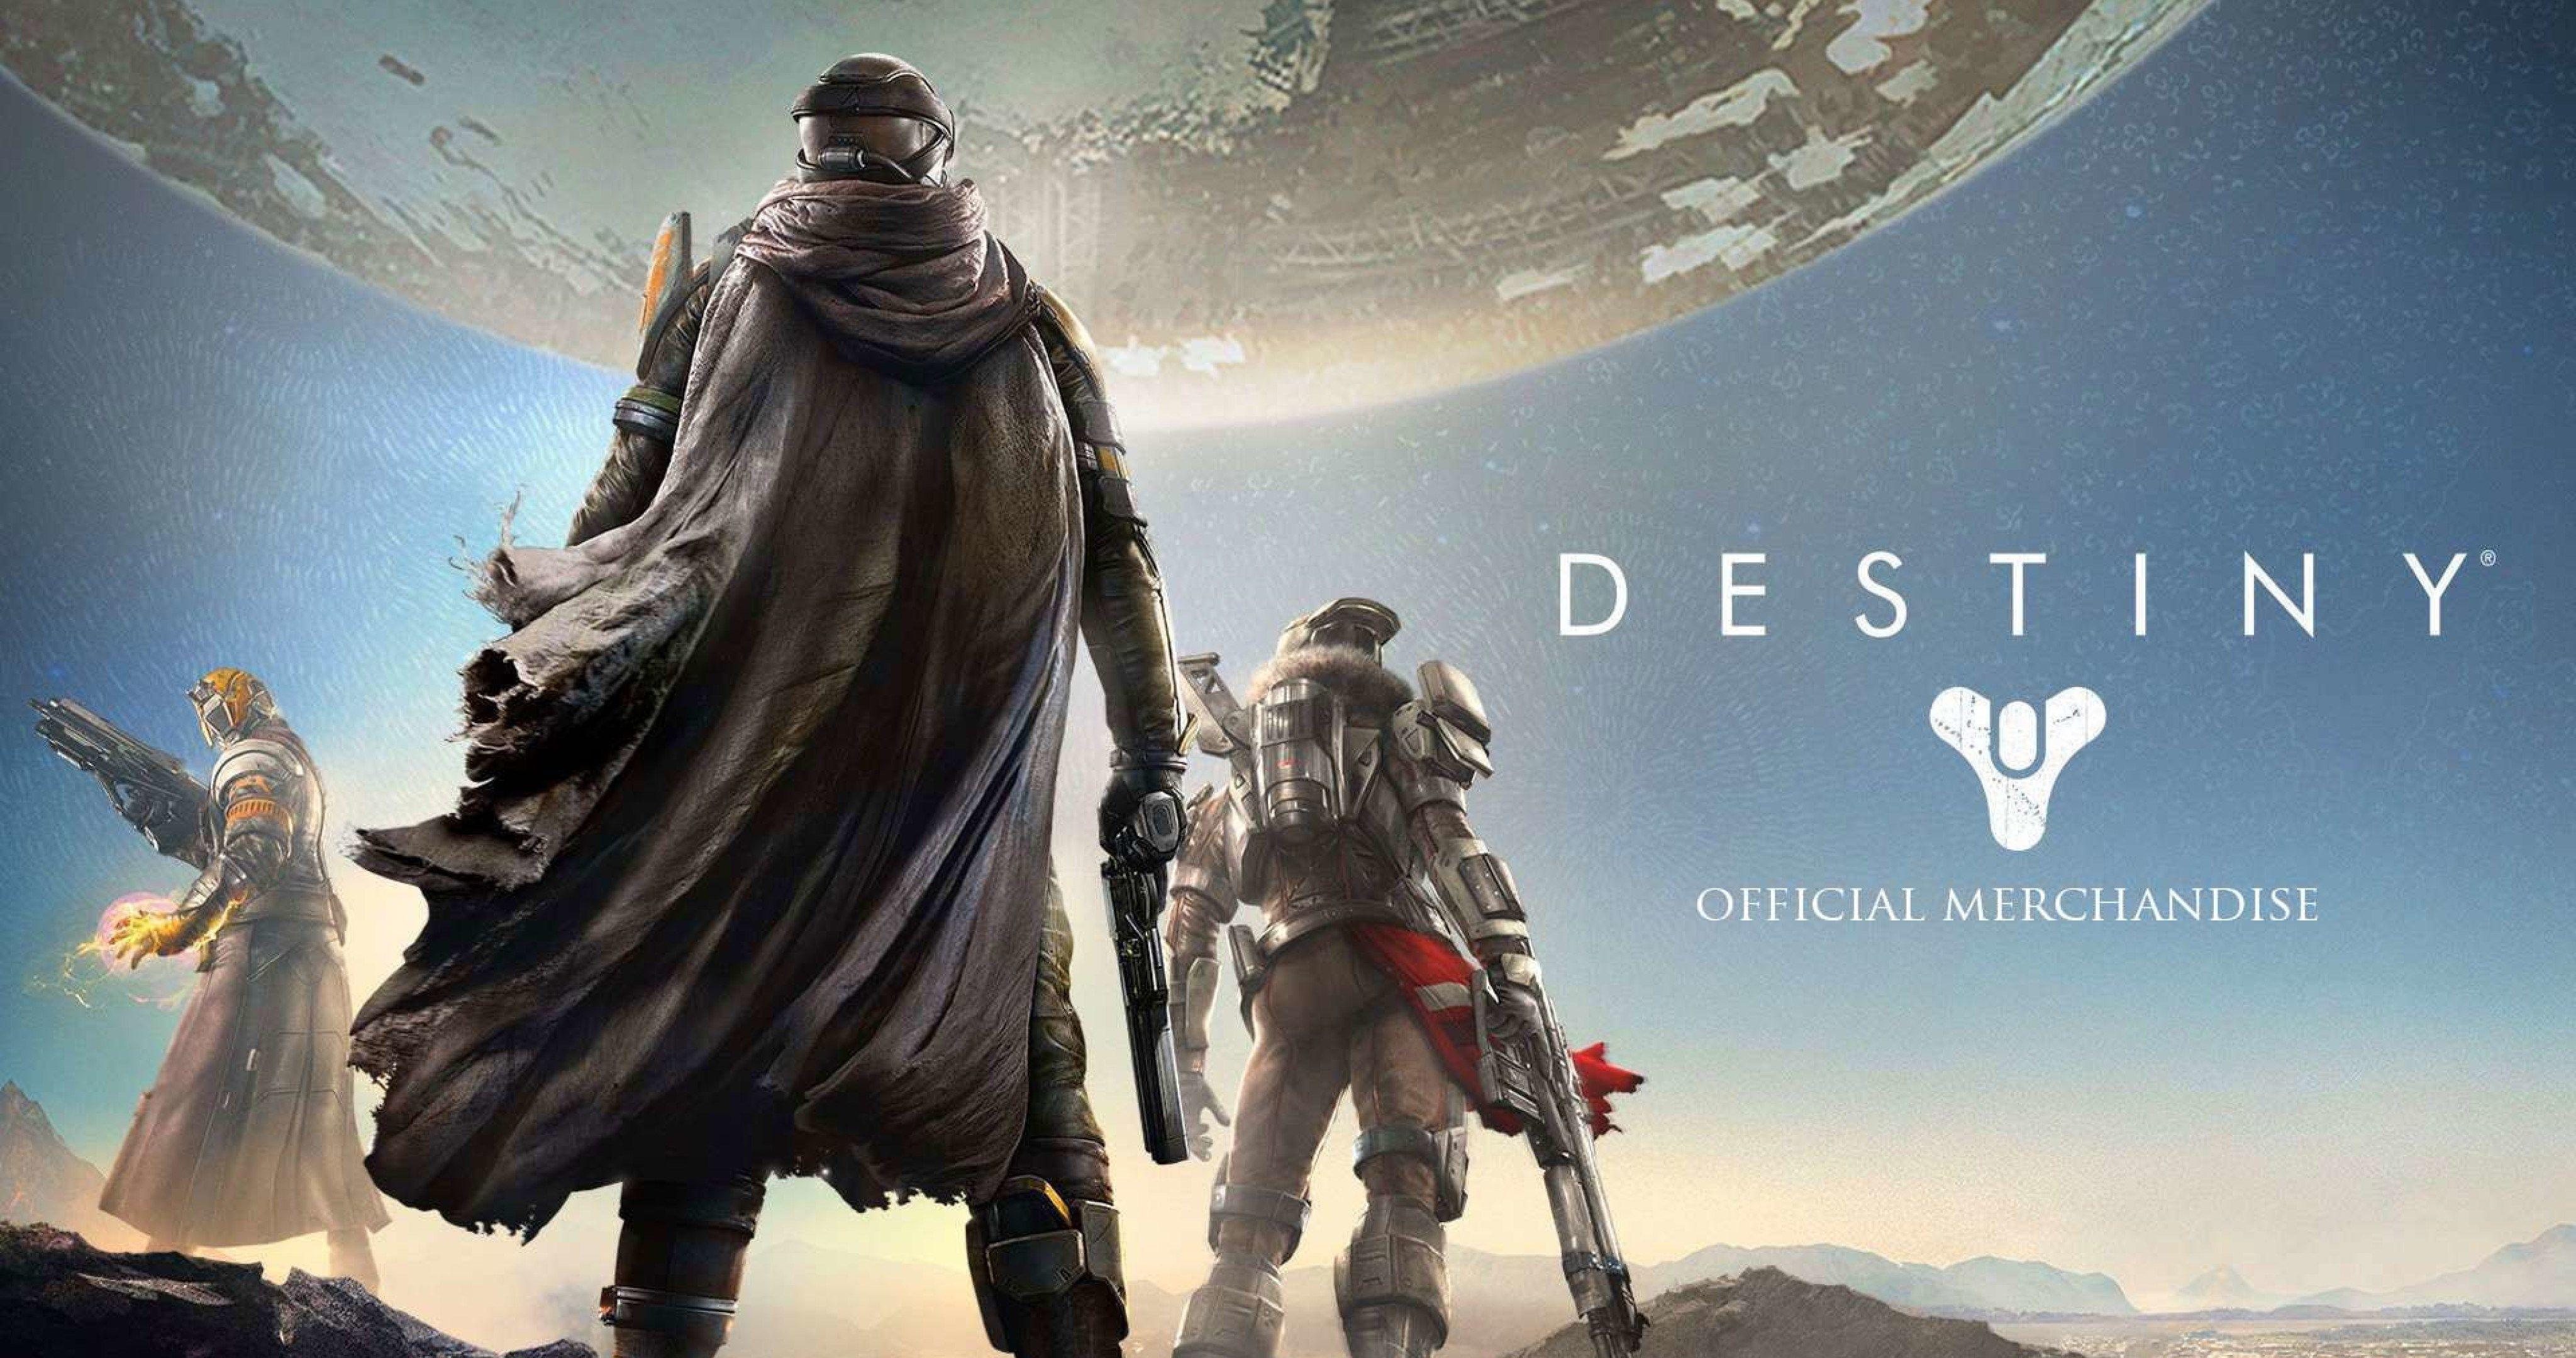 Destiny 4k Ultra Hd Wallpaper Destiny Game Destiny Xbox One Destiny Xbox